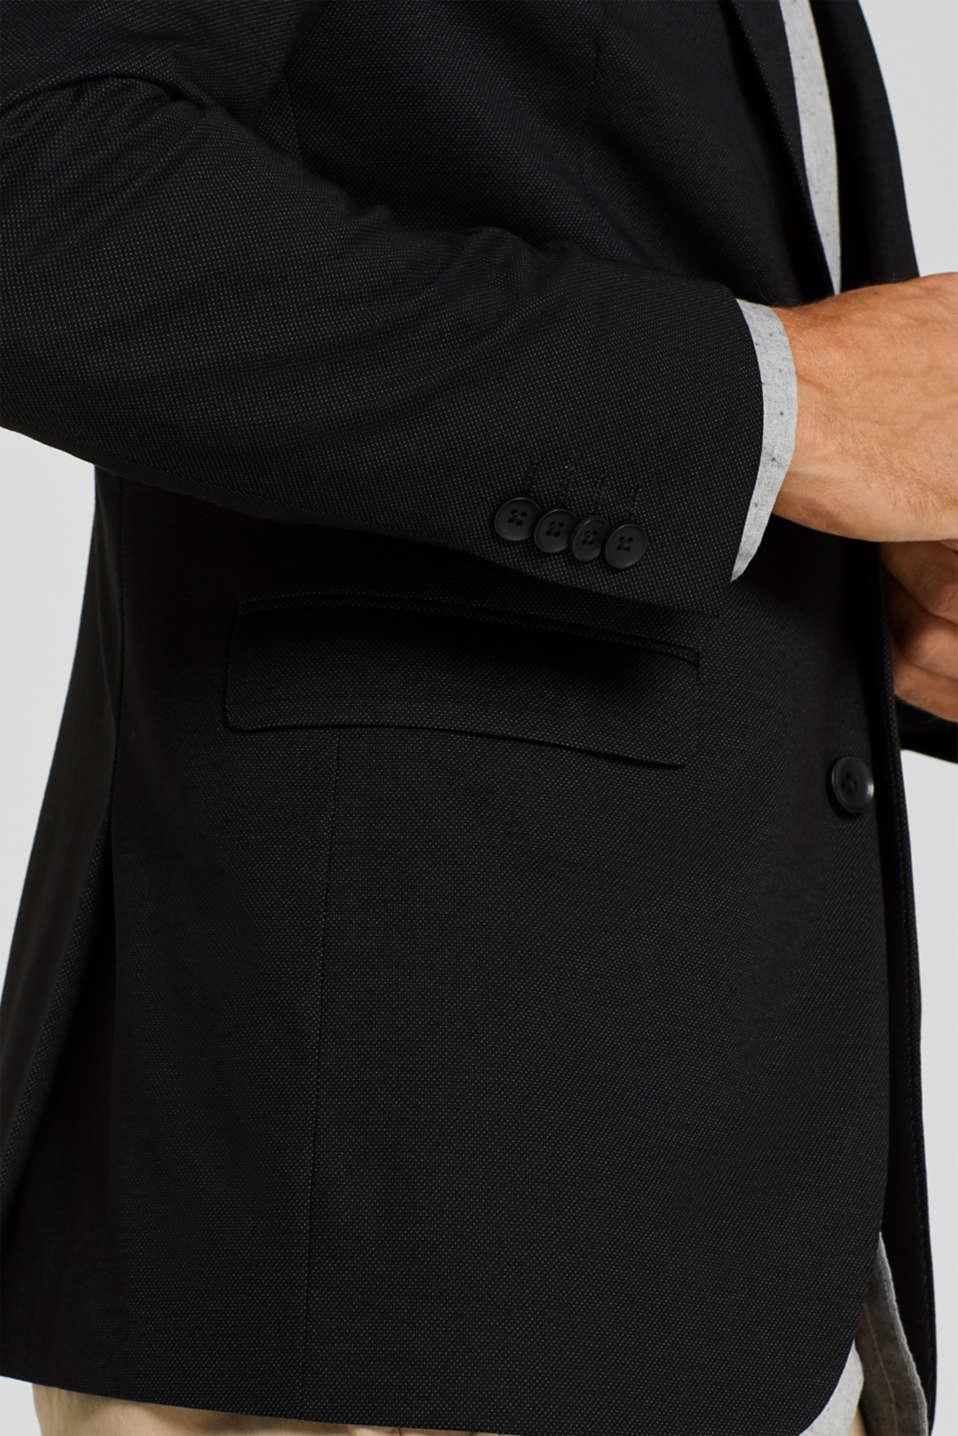 Blazers suit, BLACK, detail image number 6